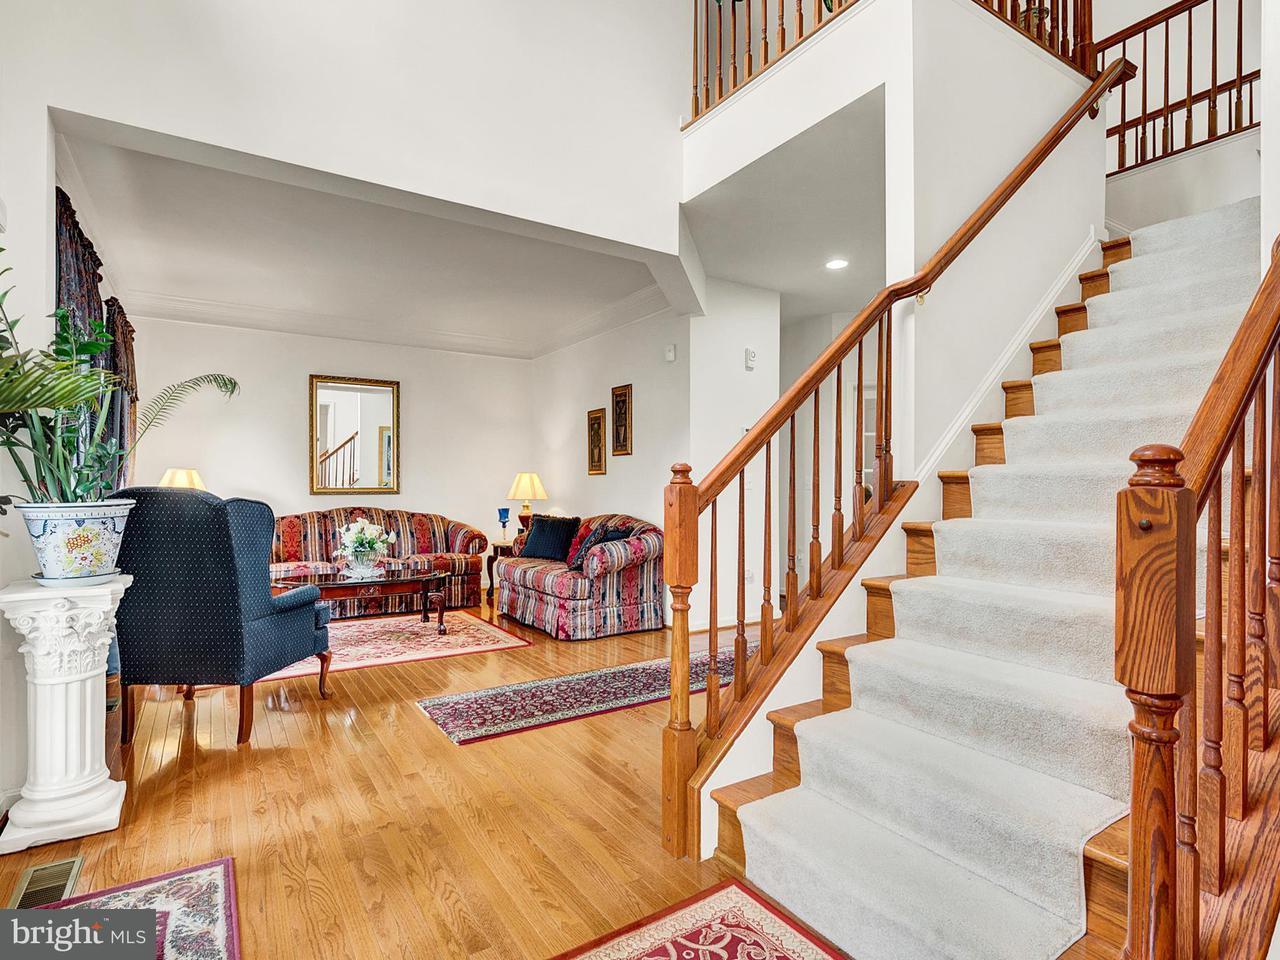 Single Family Home for Sale at 842 KINGSBROOK Road 842 KINGSBROOK Road Culpeper, Virginia 22701 United States